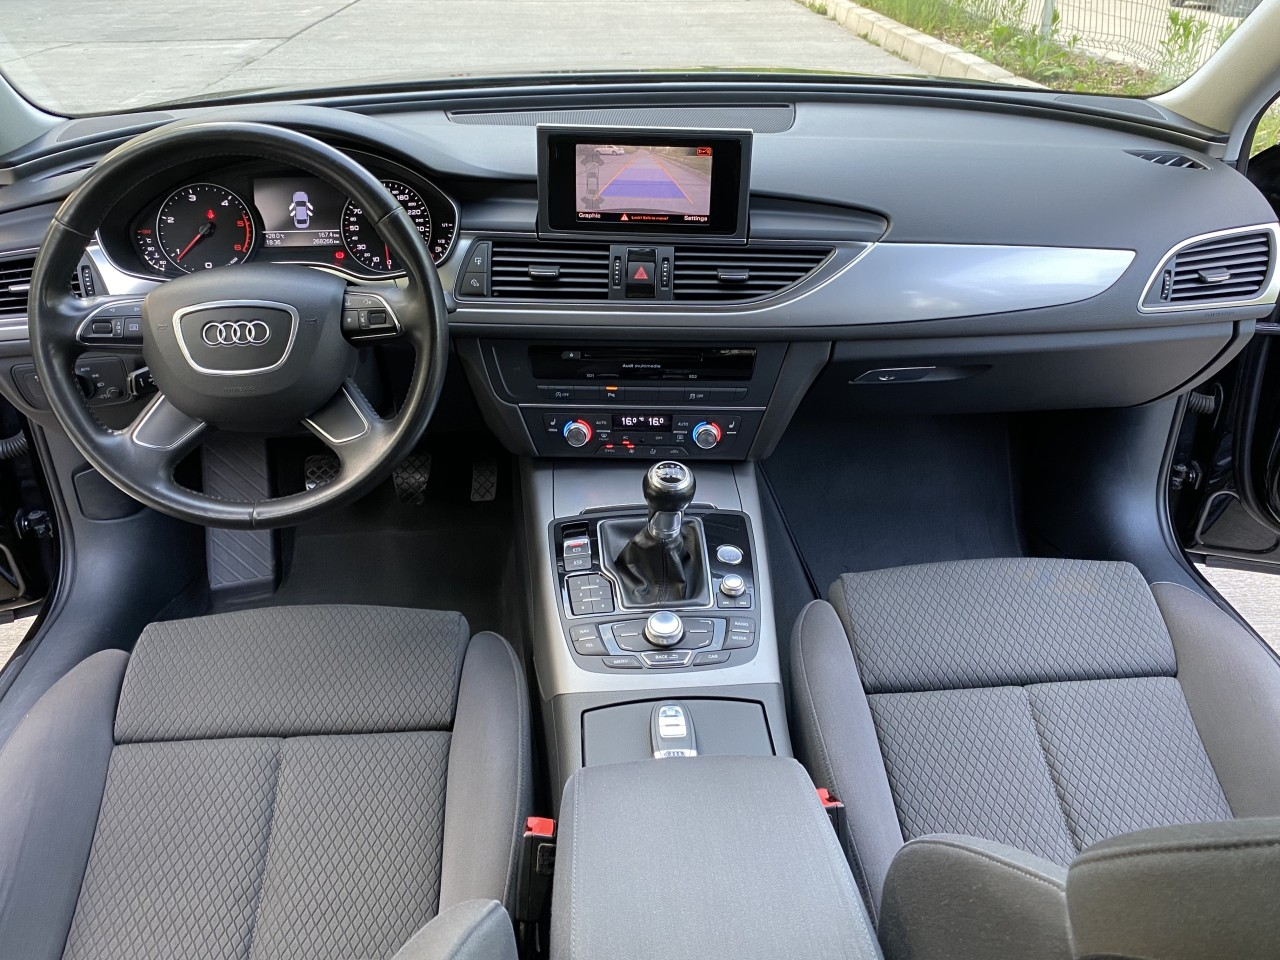 Audi A6 2.0 TDI 177cp full neon  camera fab. 2013